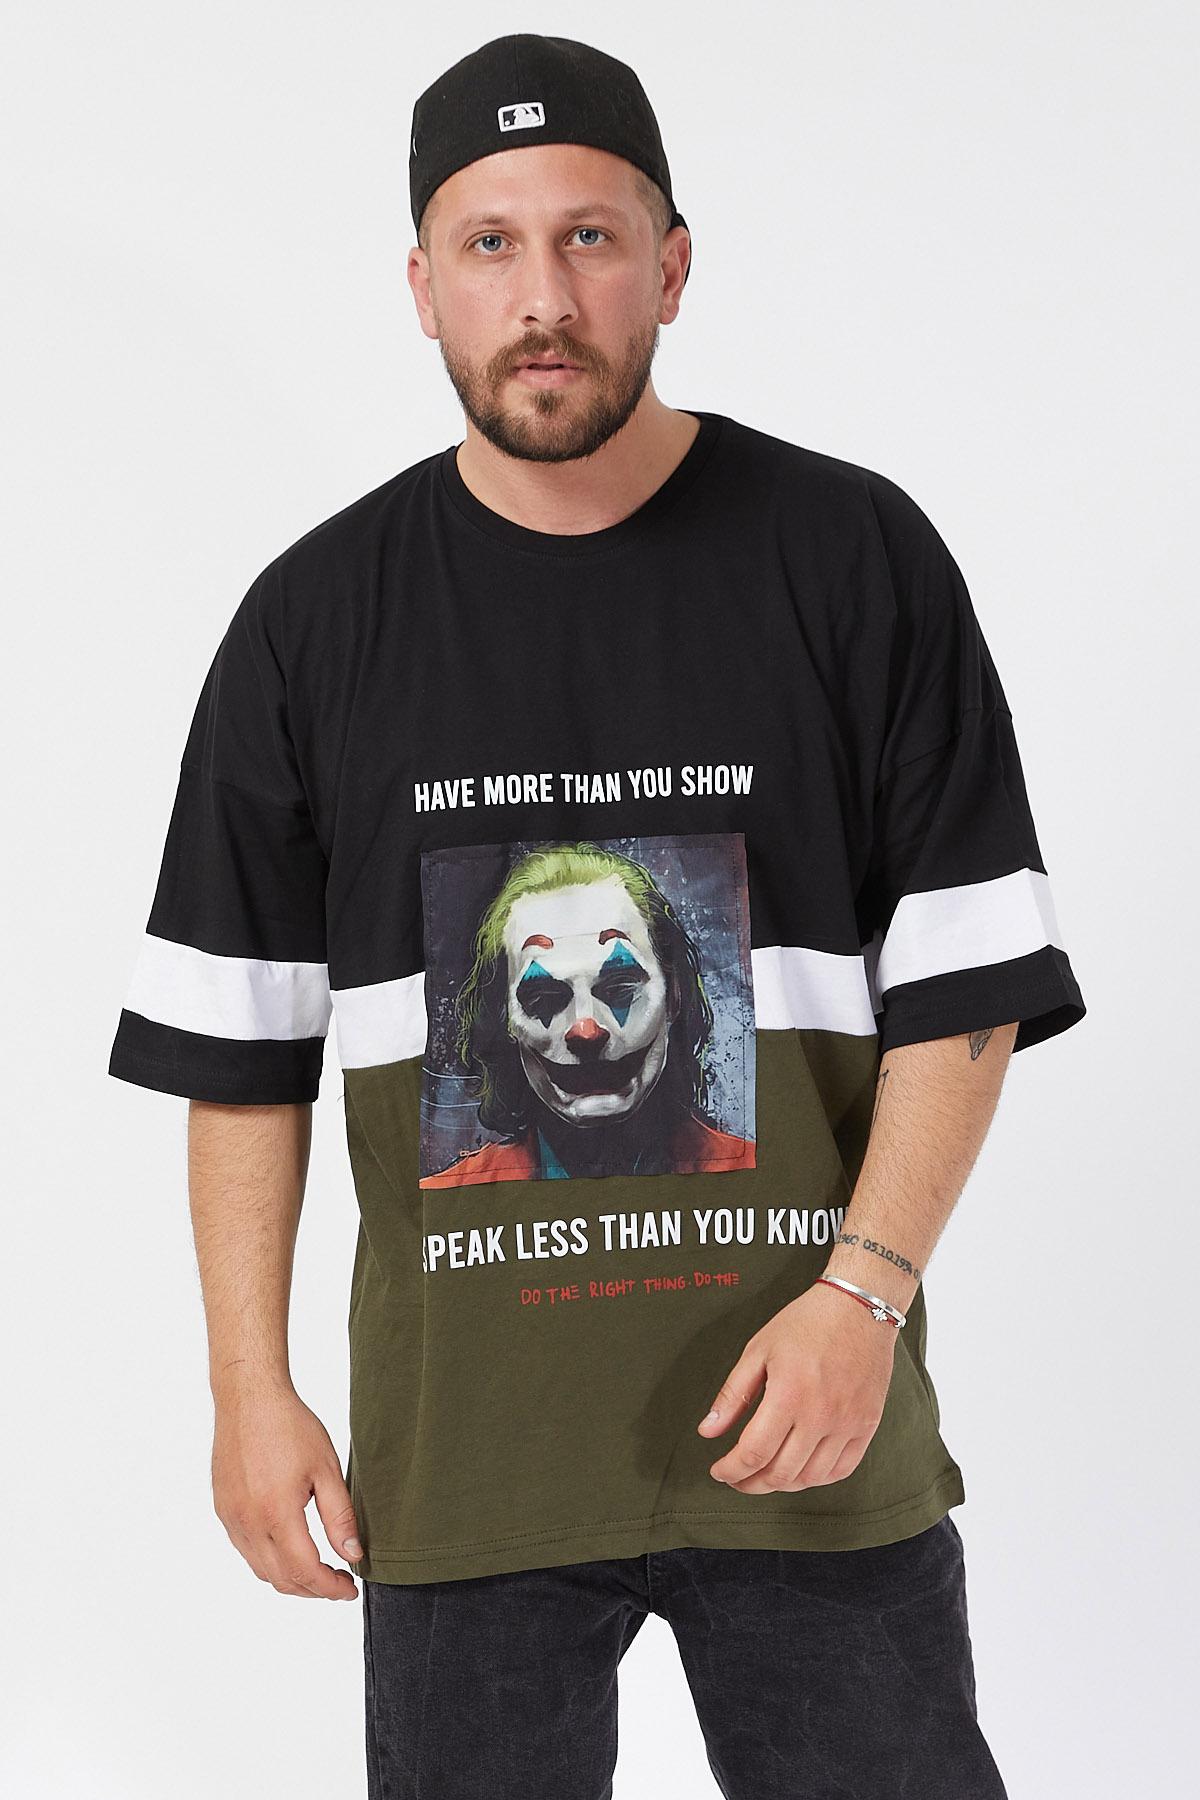 XHAN - Siyah Baskılı Bloklu Oversie T-Shirt 1KXE1-44593-02